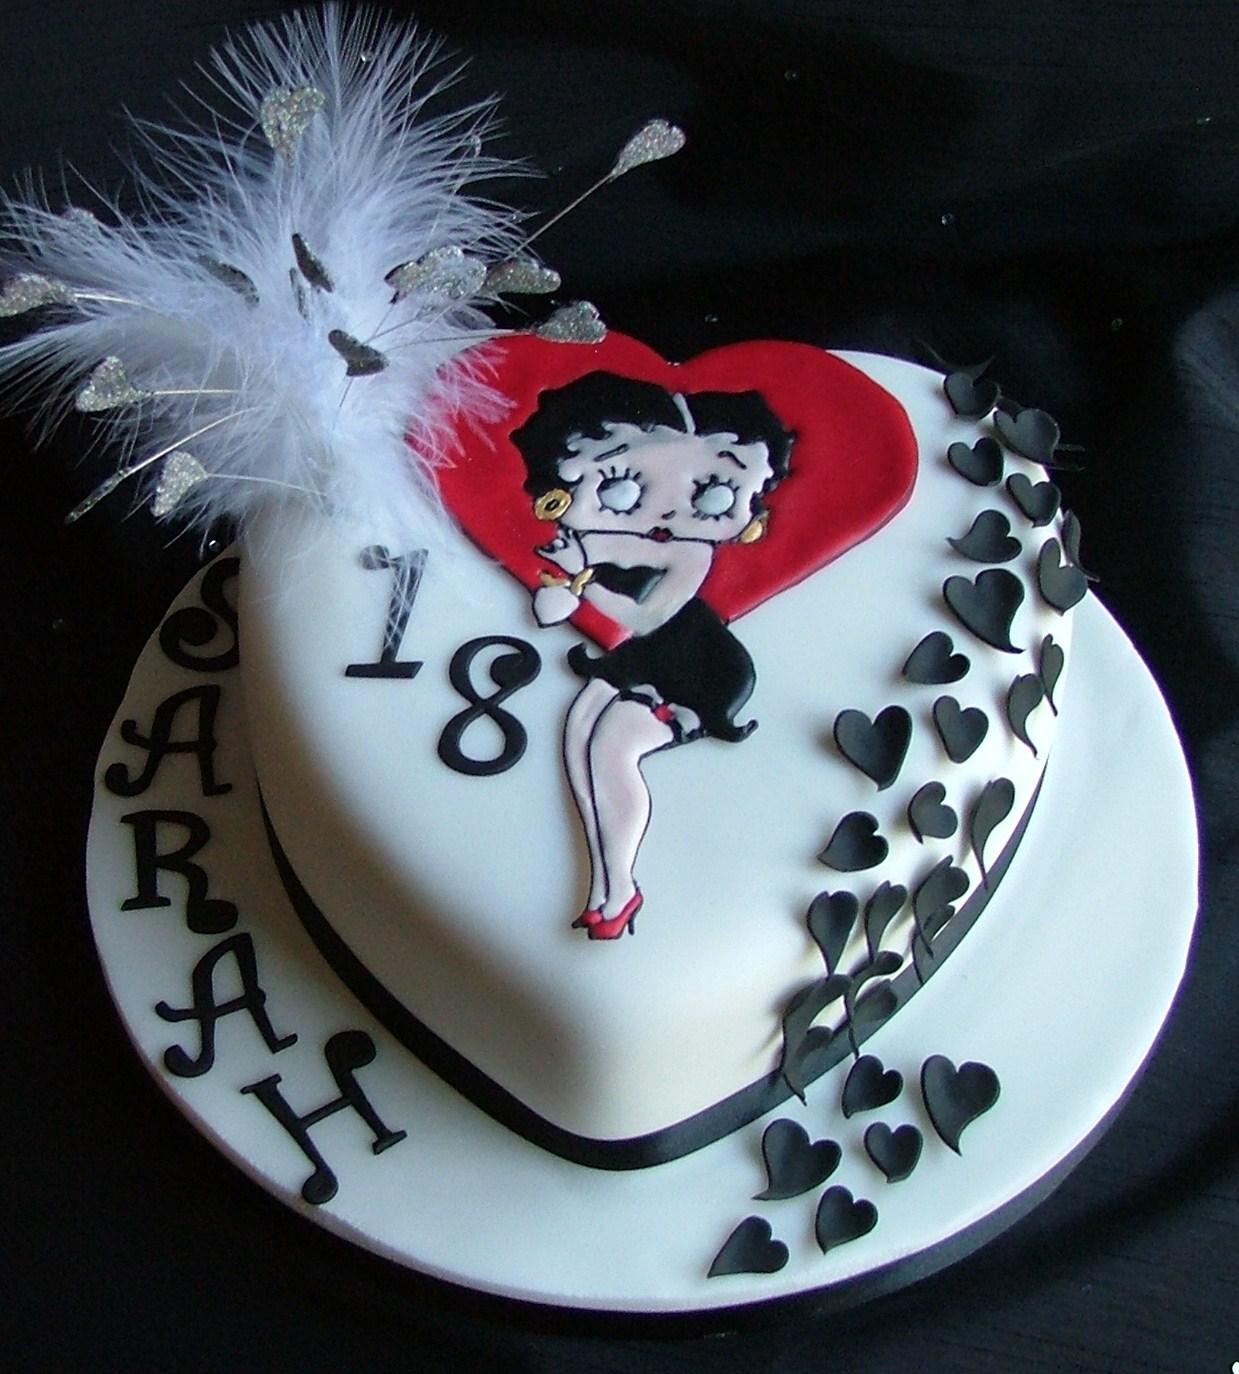 Swell Black Hearts Betty Boop Too Nice To Slice Funny Birthday Cards Online Hendilapandamsfinfo